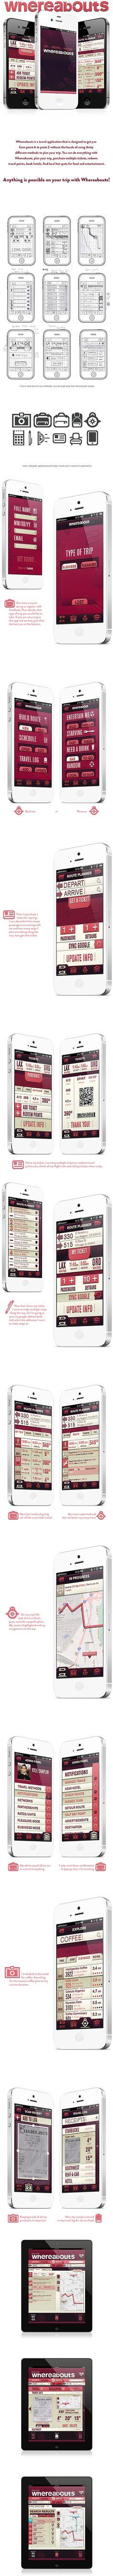 http://www.behance.net/gallery/Whereabouts-iOS-App/5941145